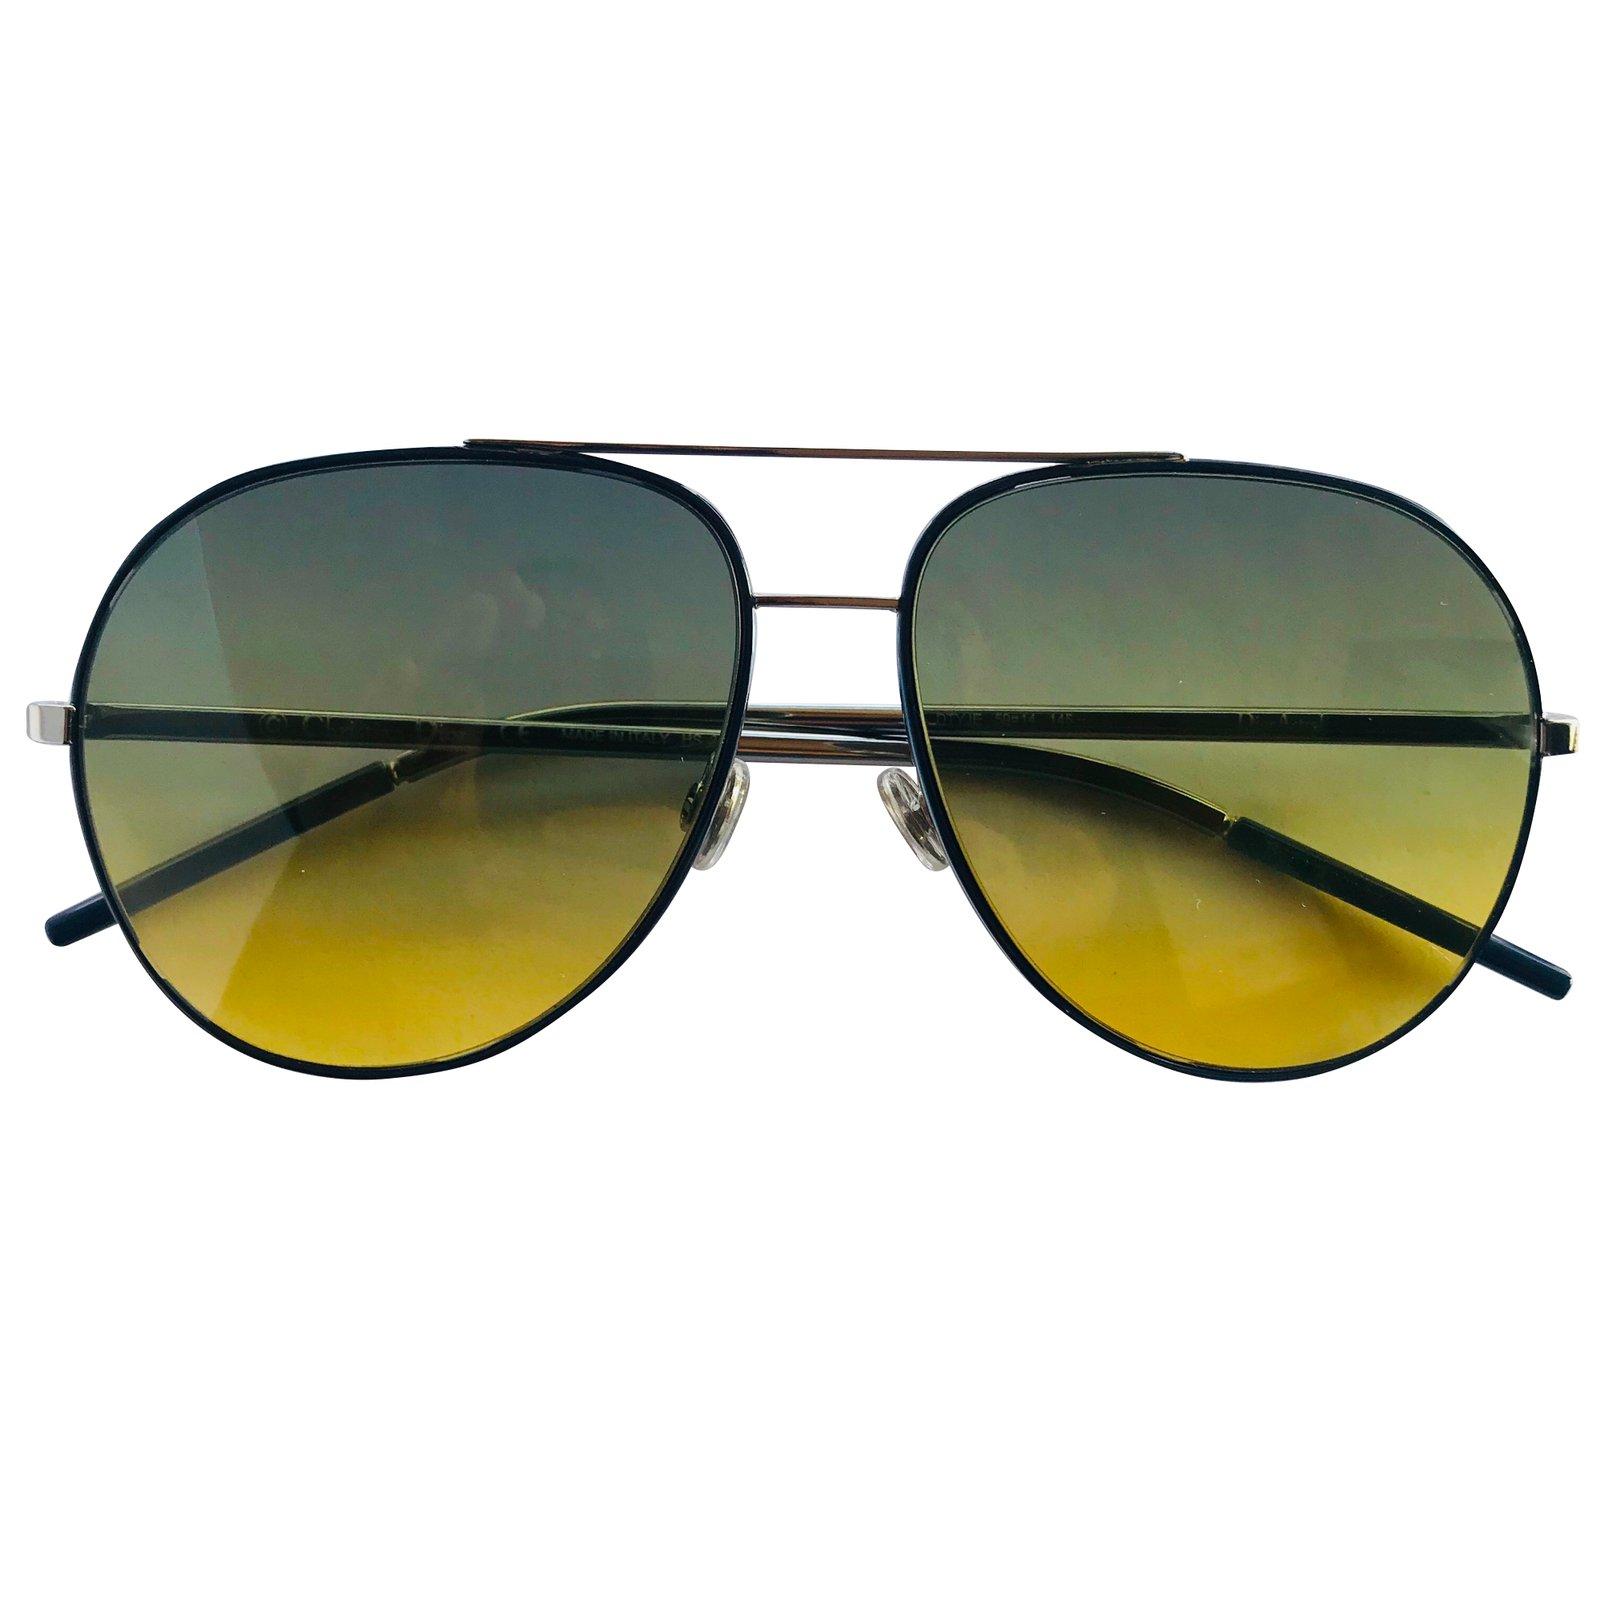 1a71b86bca95 Christian Dior Dior sunglasses men Sunglasses Metal Silvery ref.48780